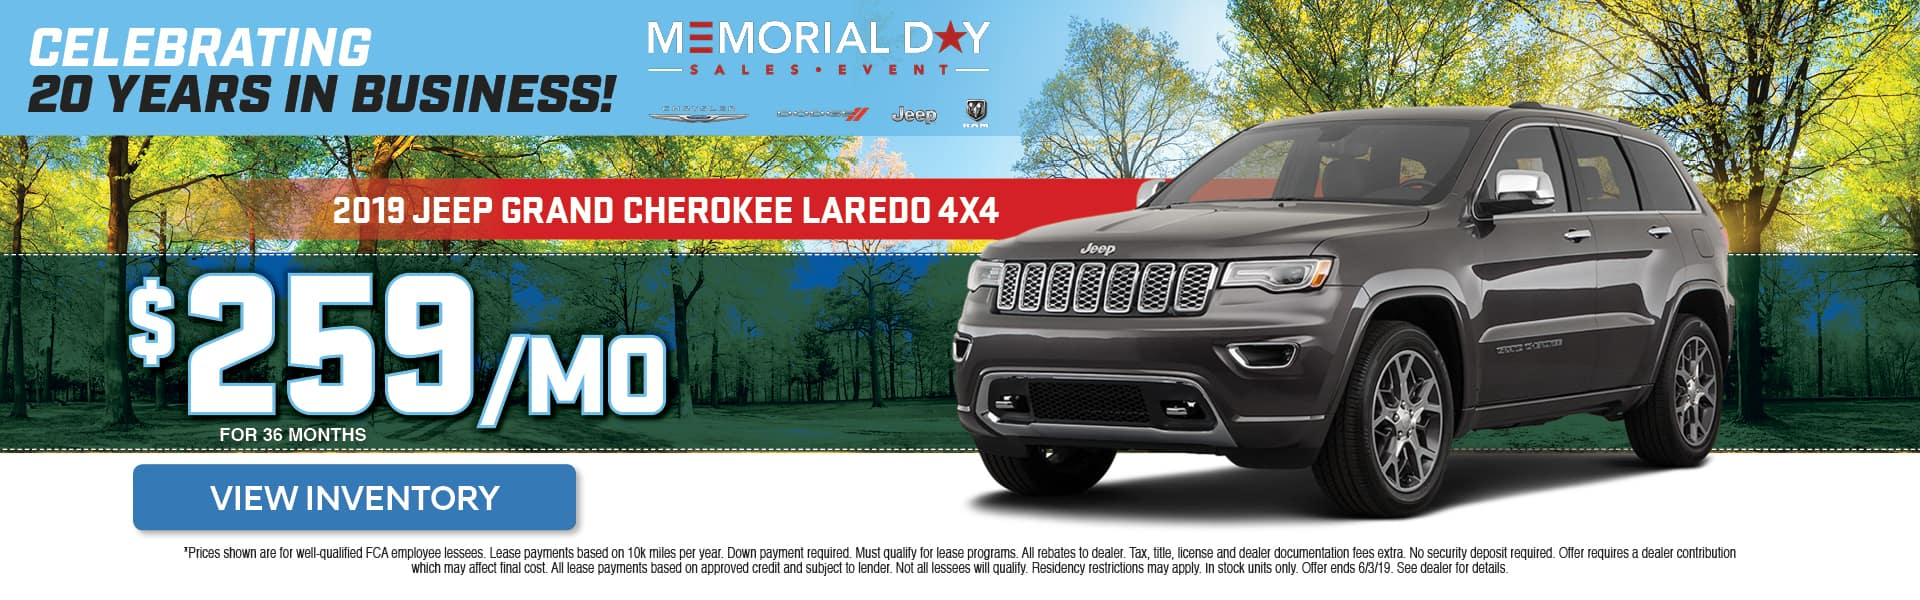 New JEEP Grand Cherokee for Sale in Pinckney, MI